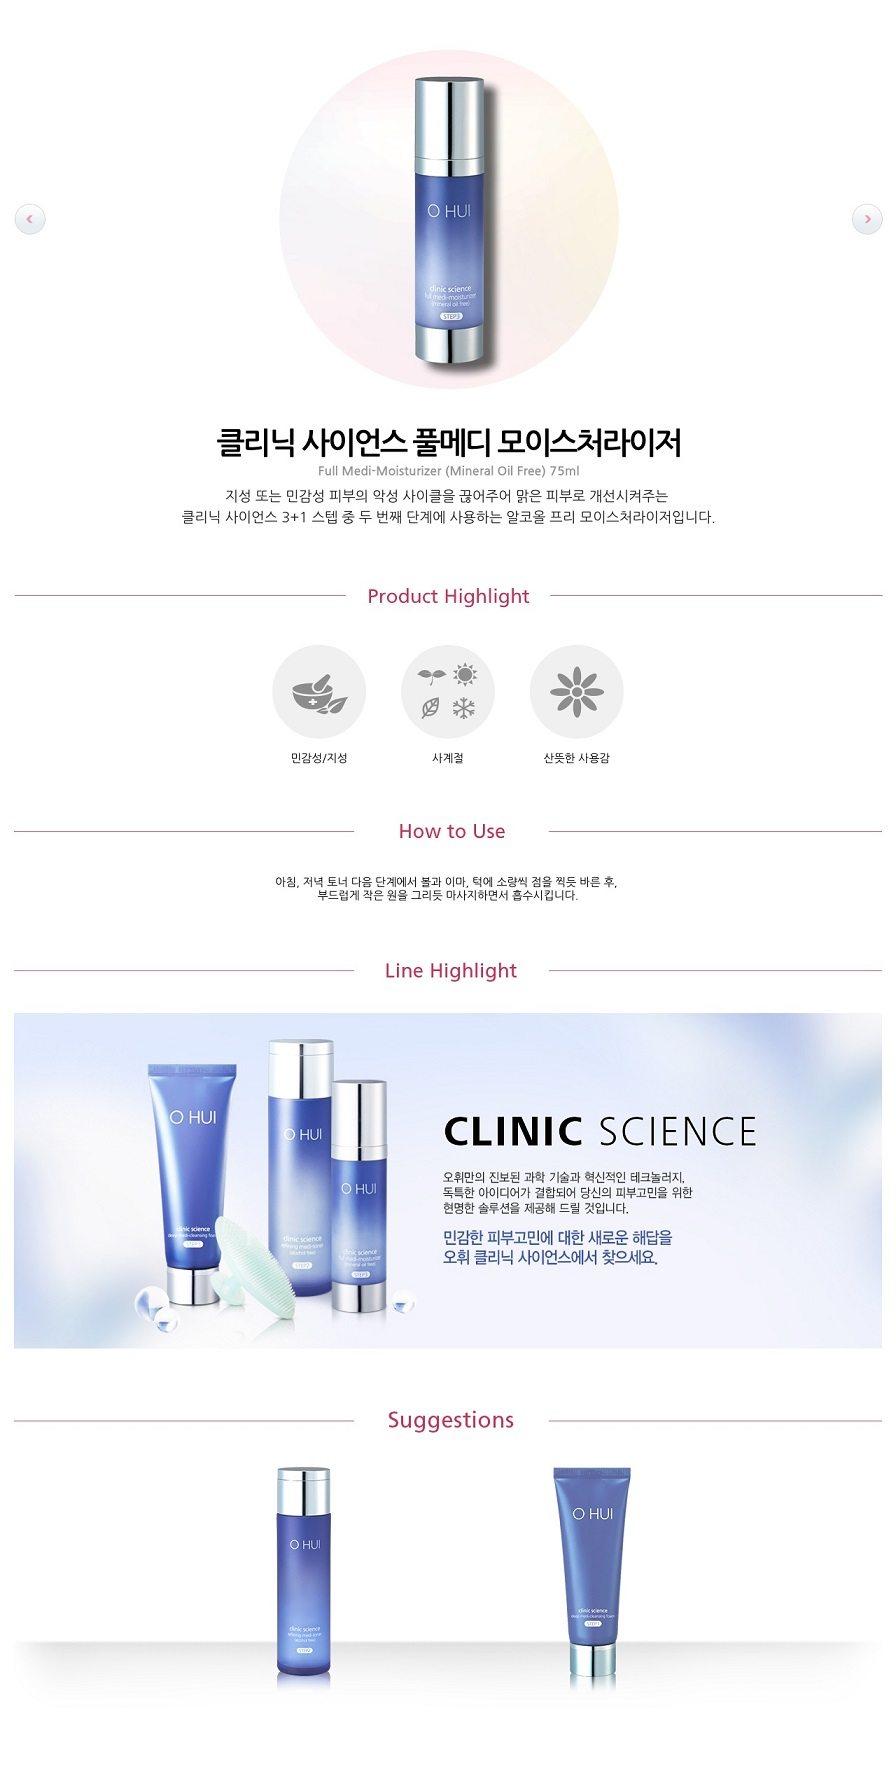 OHUI Clinic Science Full Medi Moisturizer (Mineral Oil Free) 75ml malaysia singapore indonesia